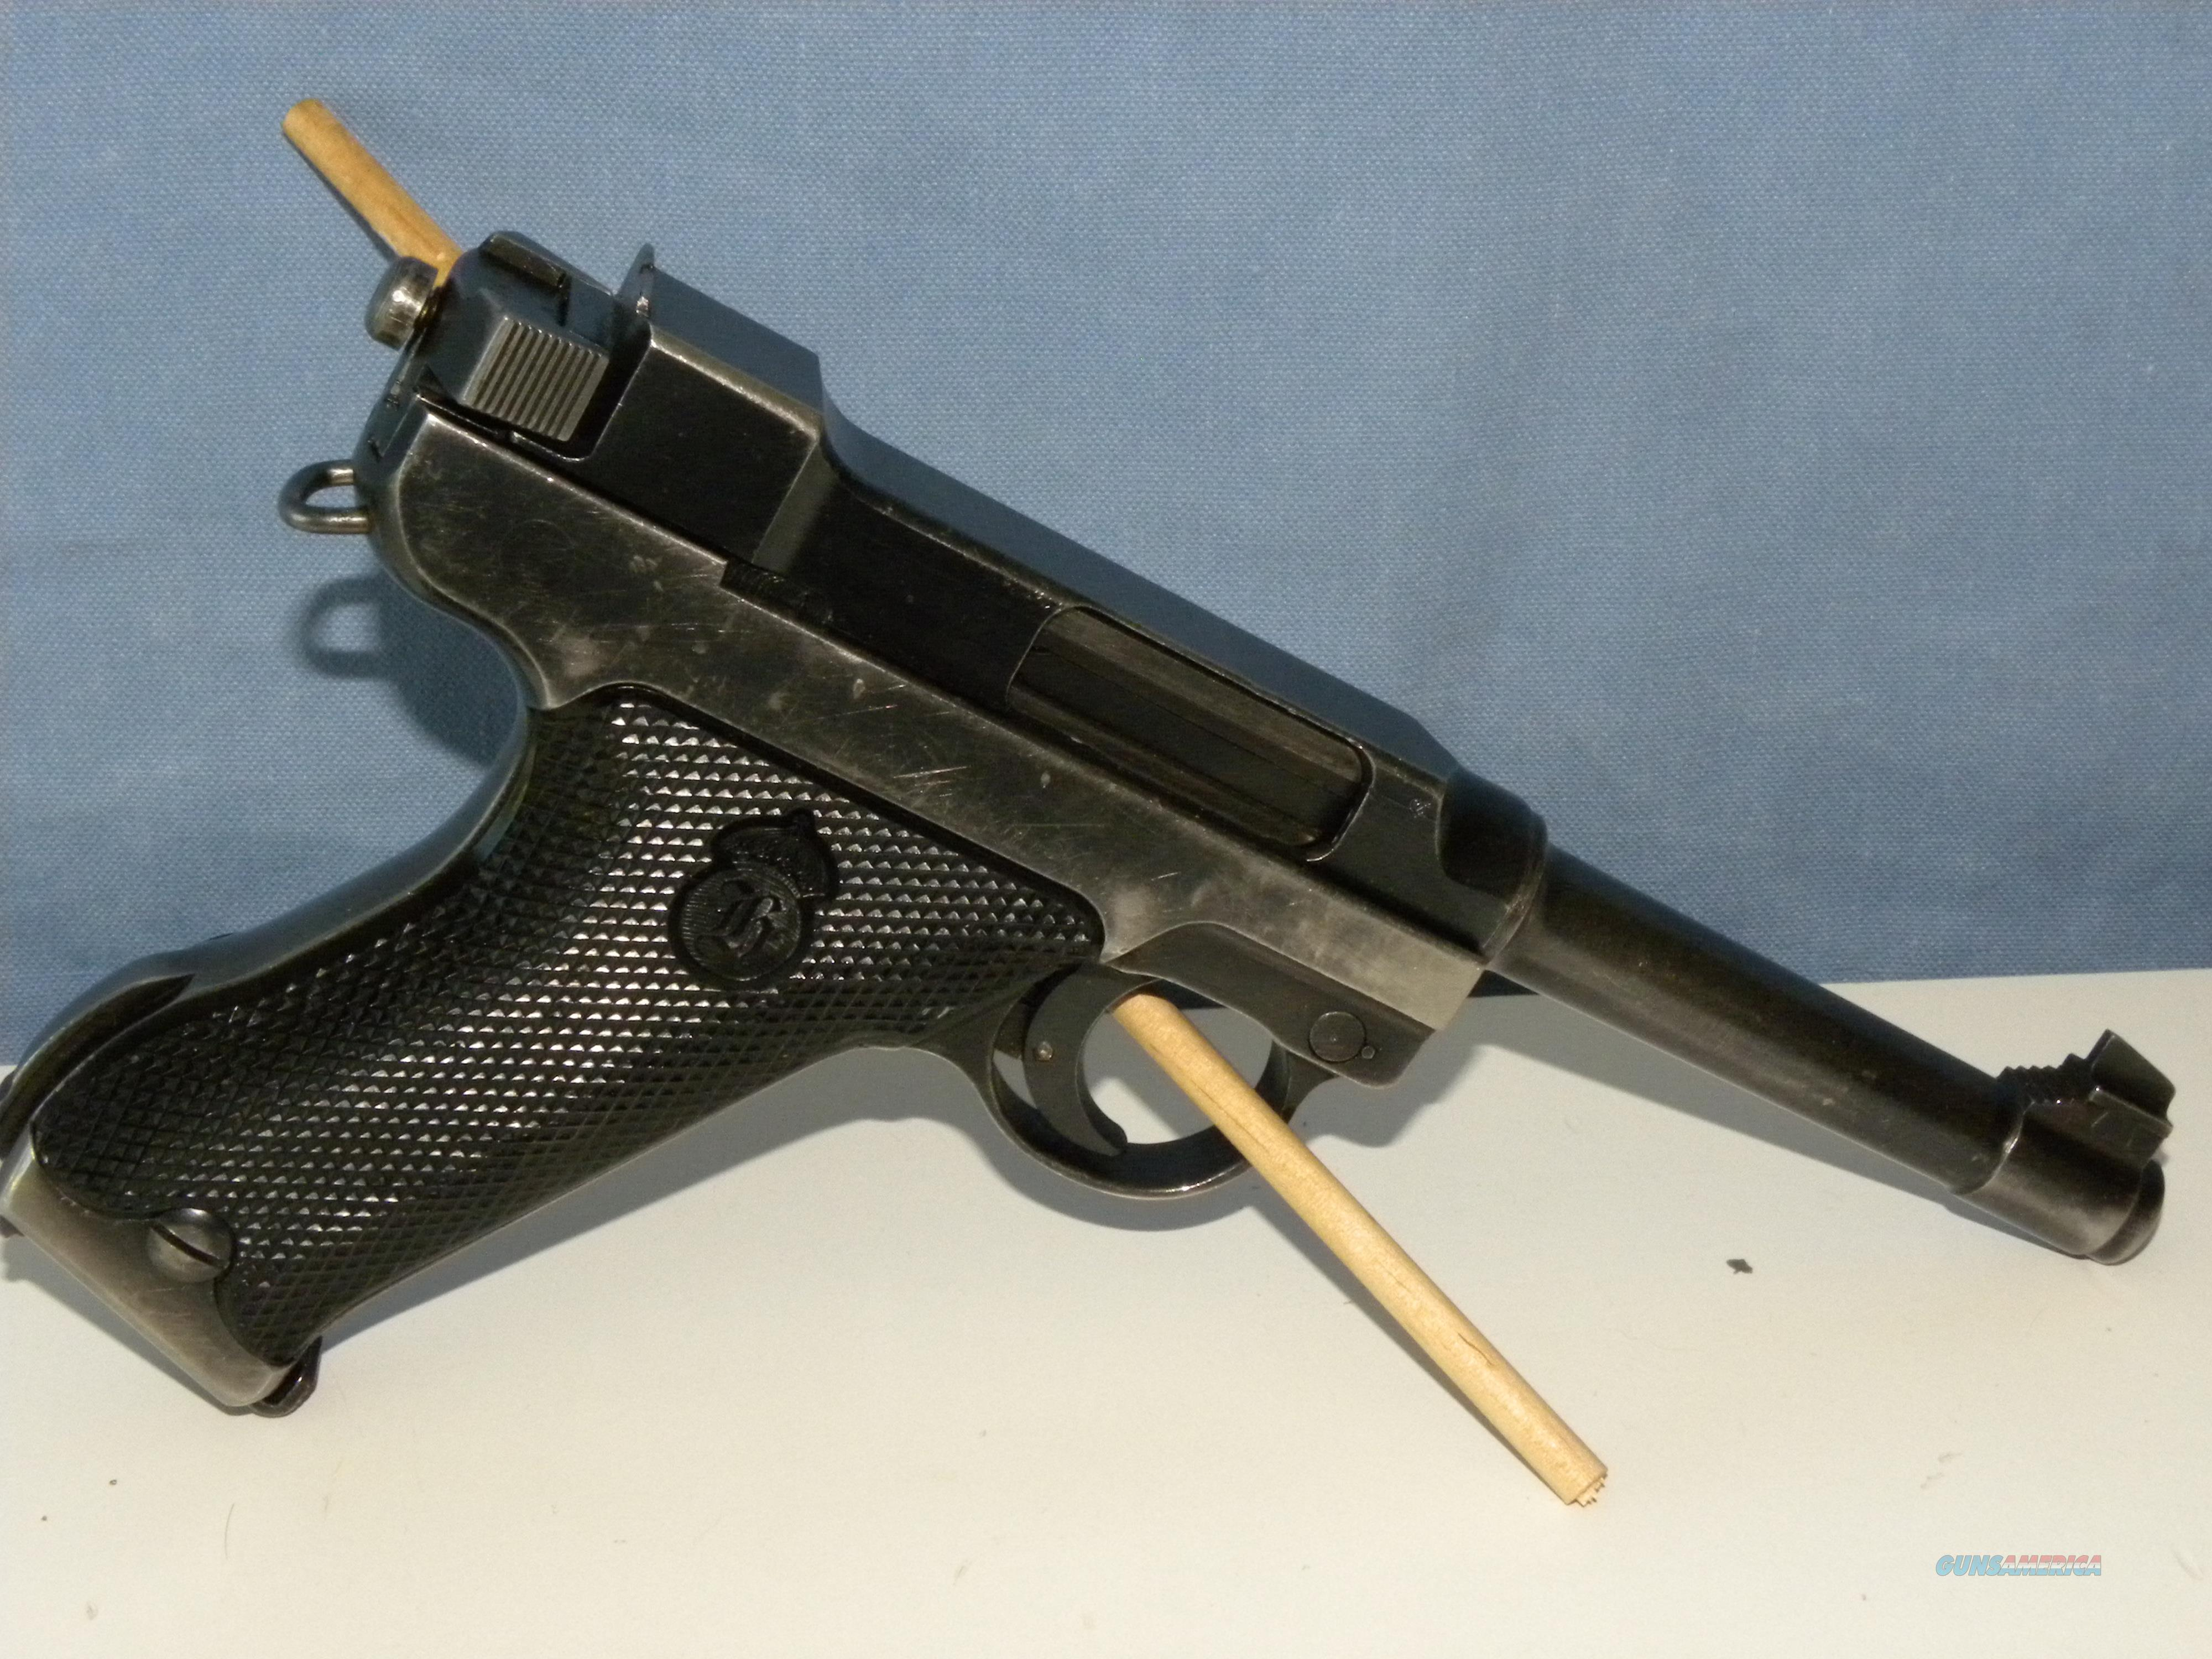 Husqvarna M40 9mm Swedish Pistol  Guns > Pistols > Husqvarna Pistols